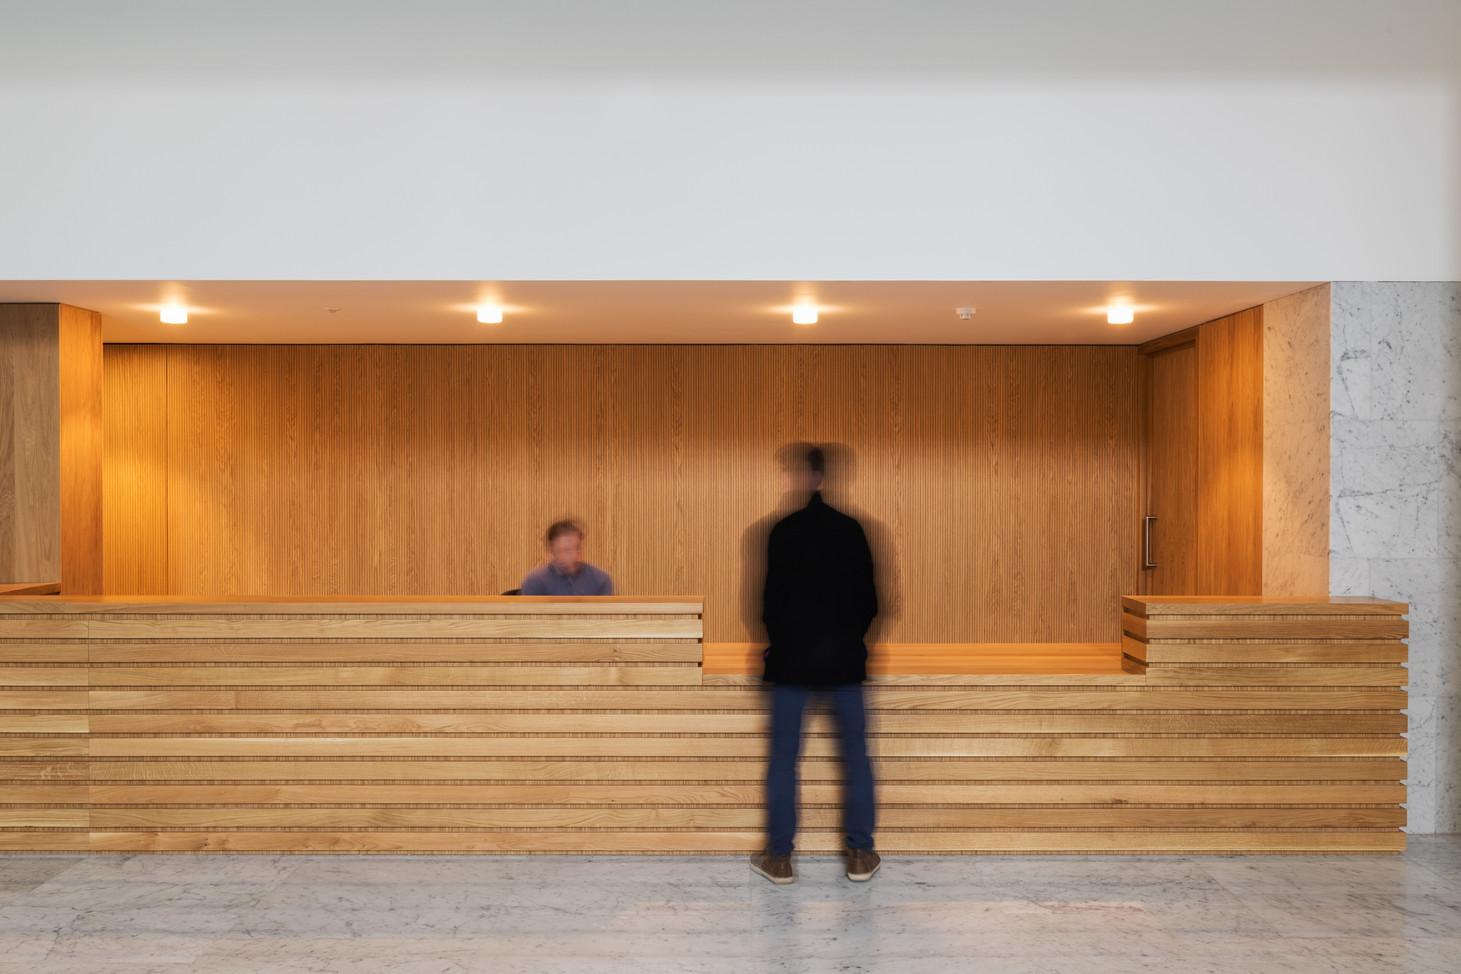 Timber reception desk of Hanging Gardens in Limerick